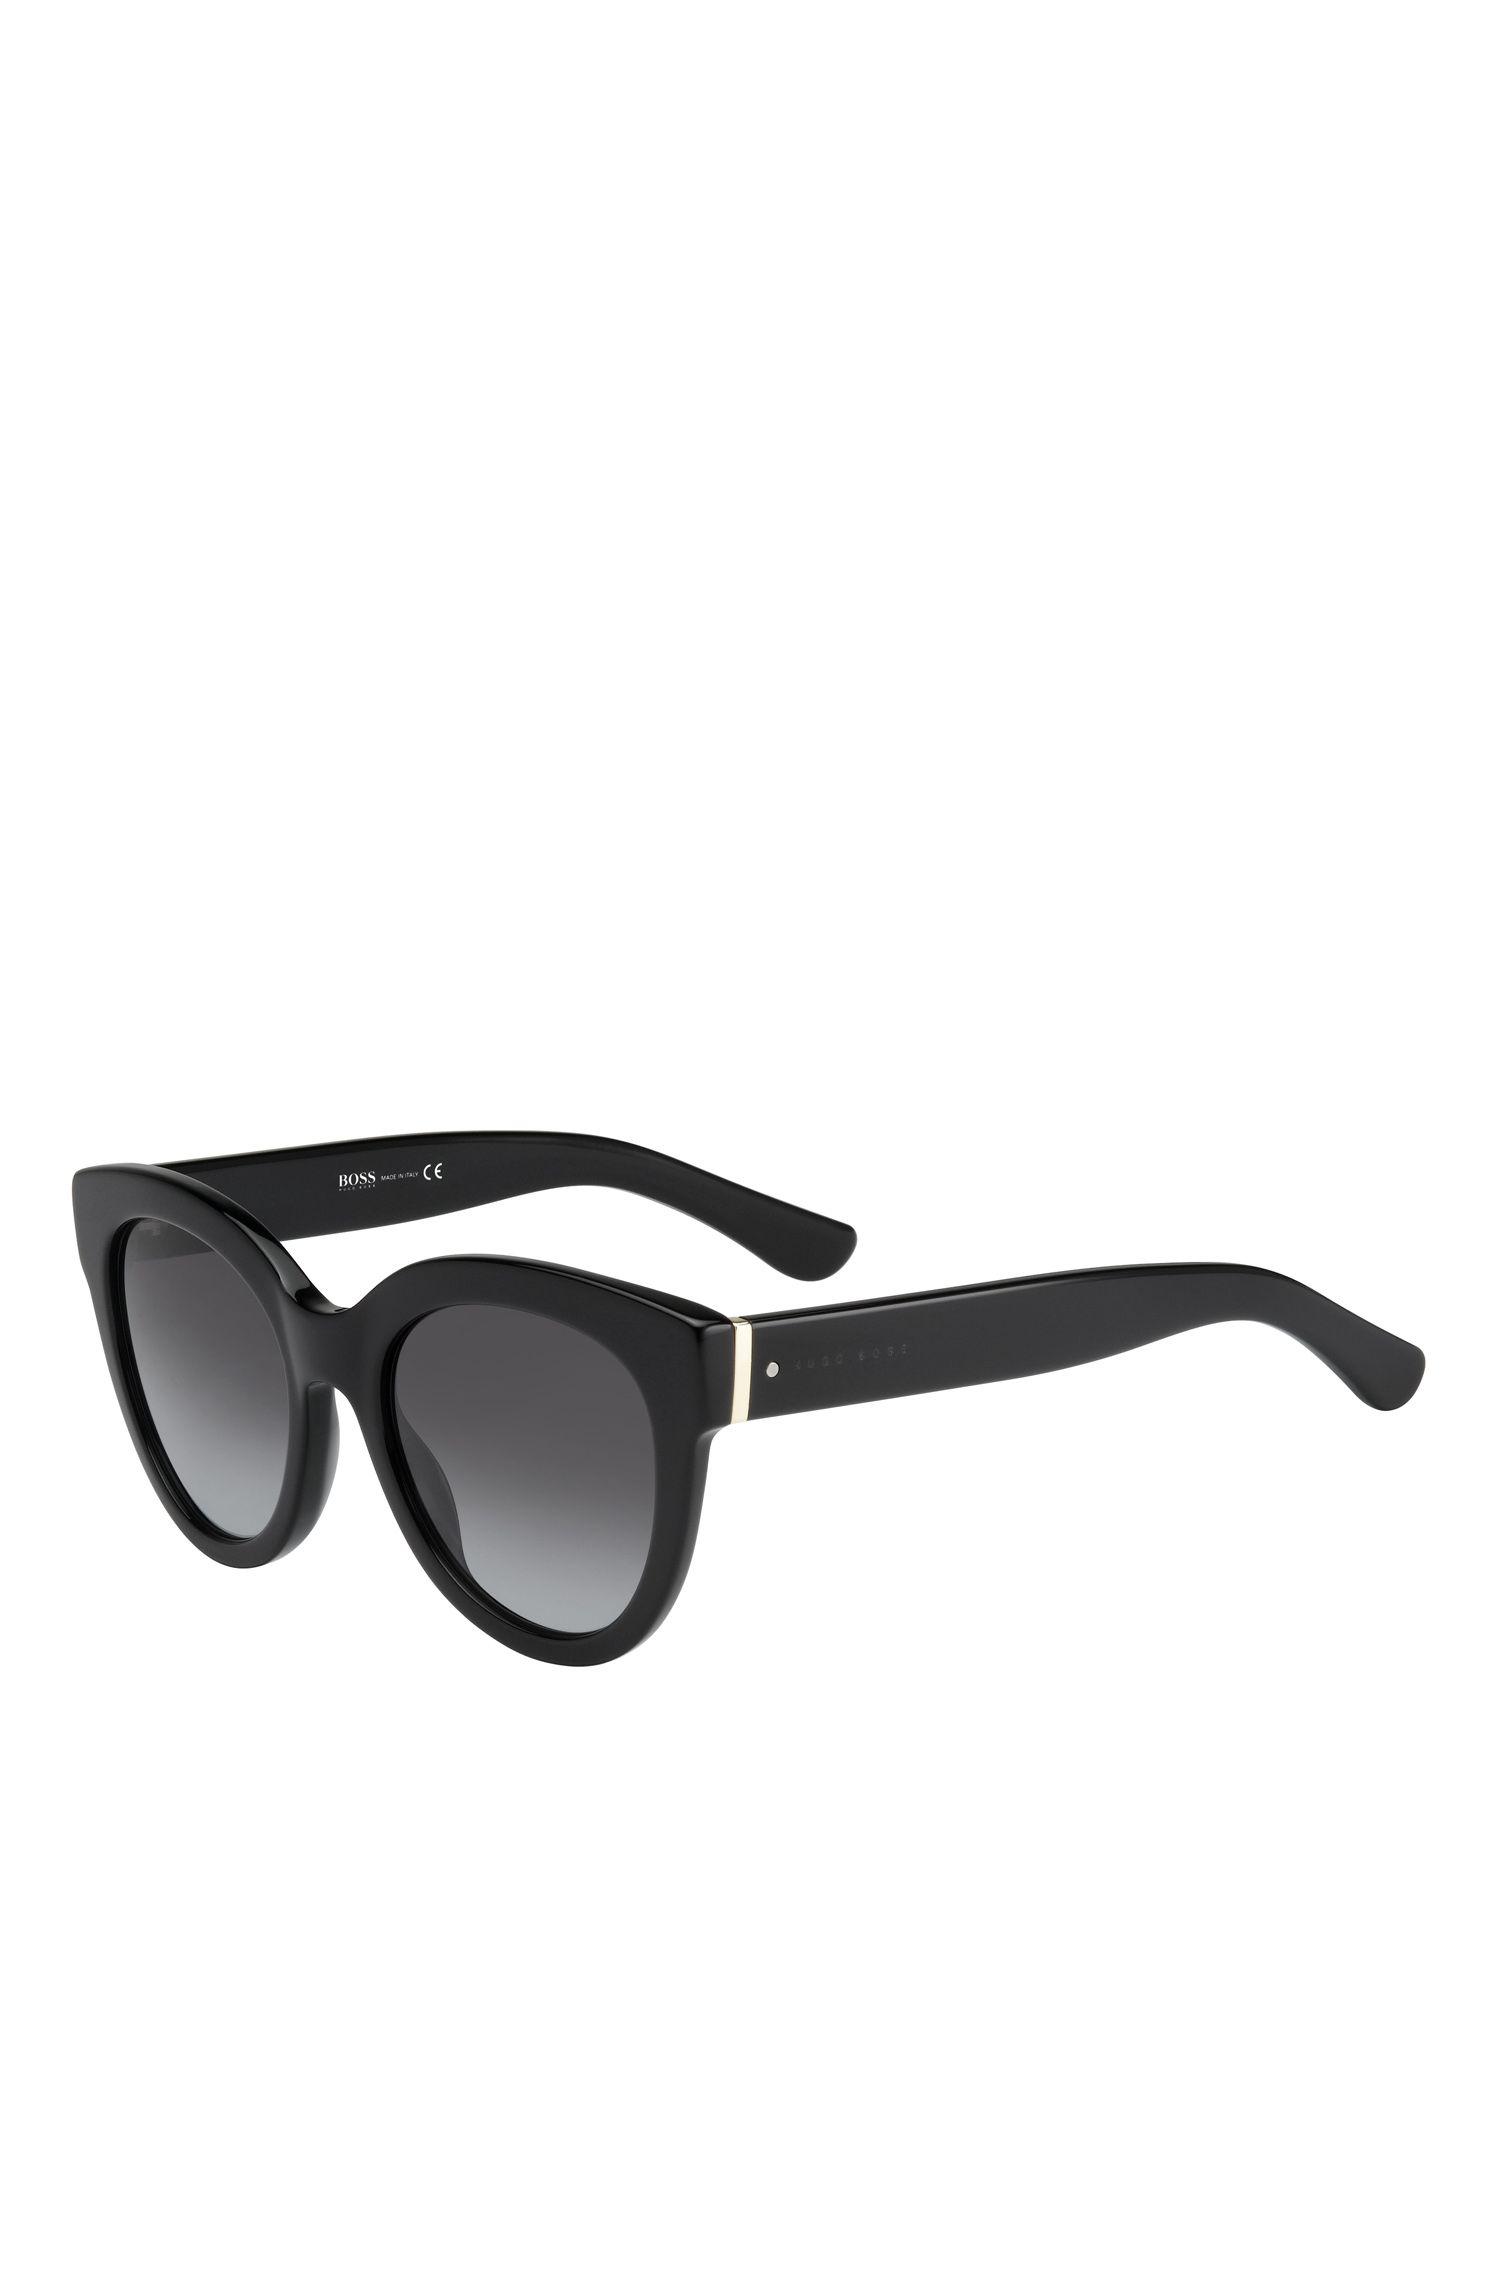 'BOSS 0675S' | Black Gradient Lens Cateye Sunglasses